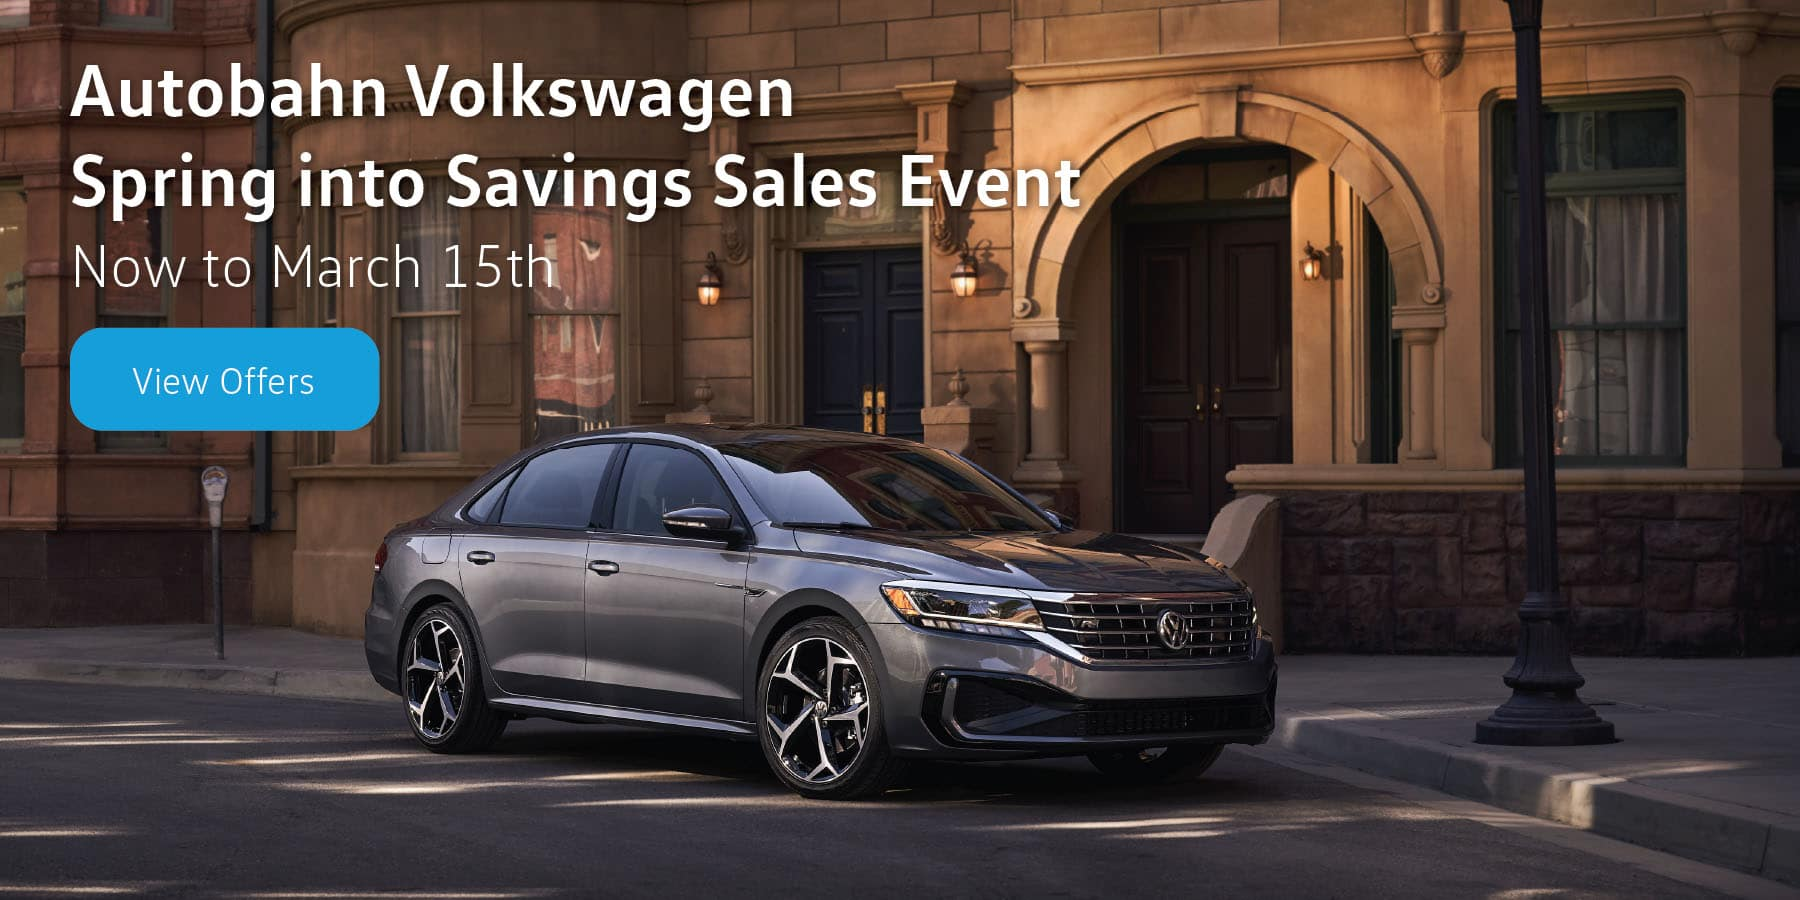 Autobahn VW Spring into Savings Sales Event